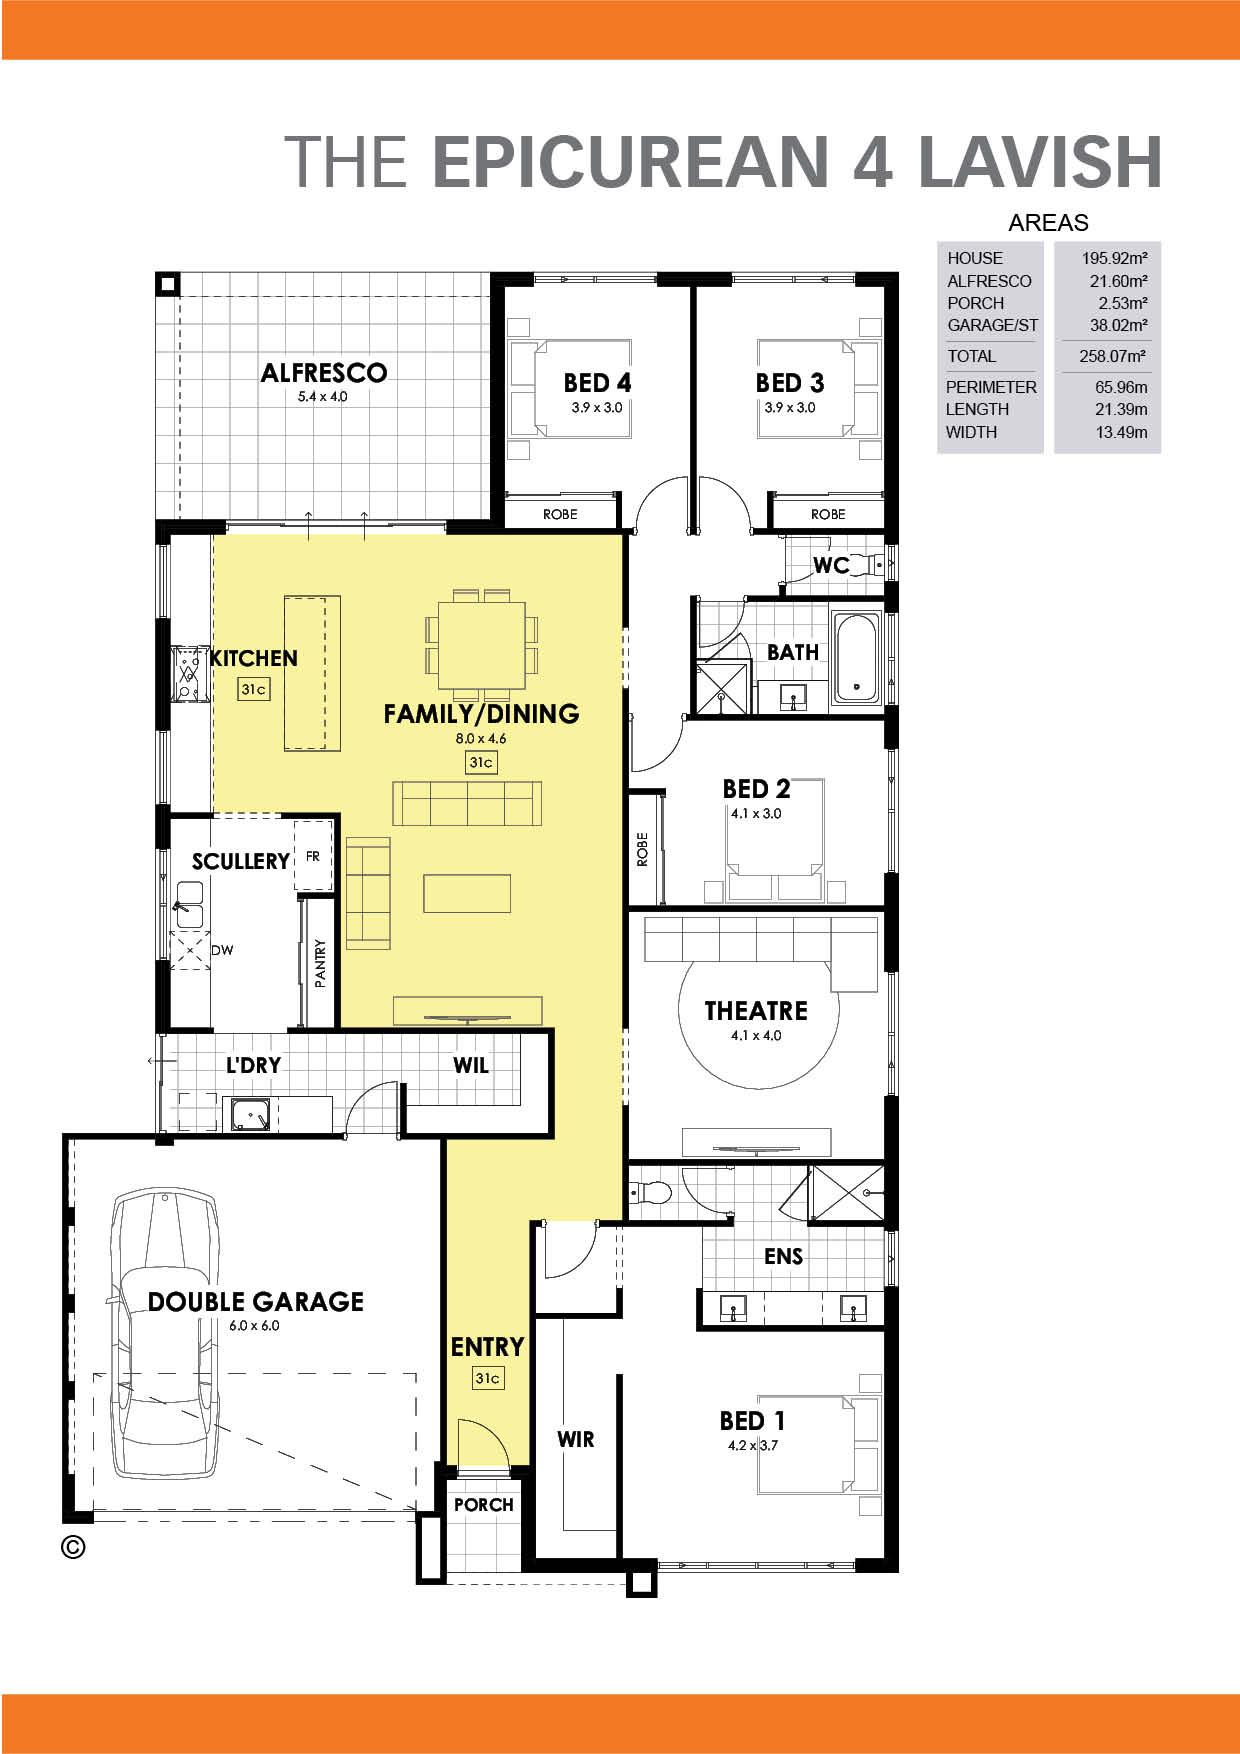 The Epicurean 4 Lavish Floorplan